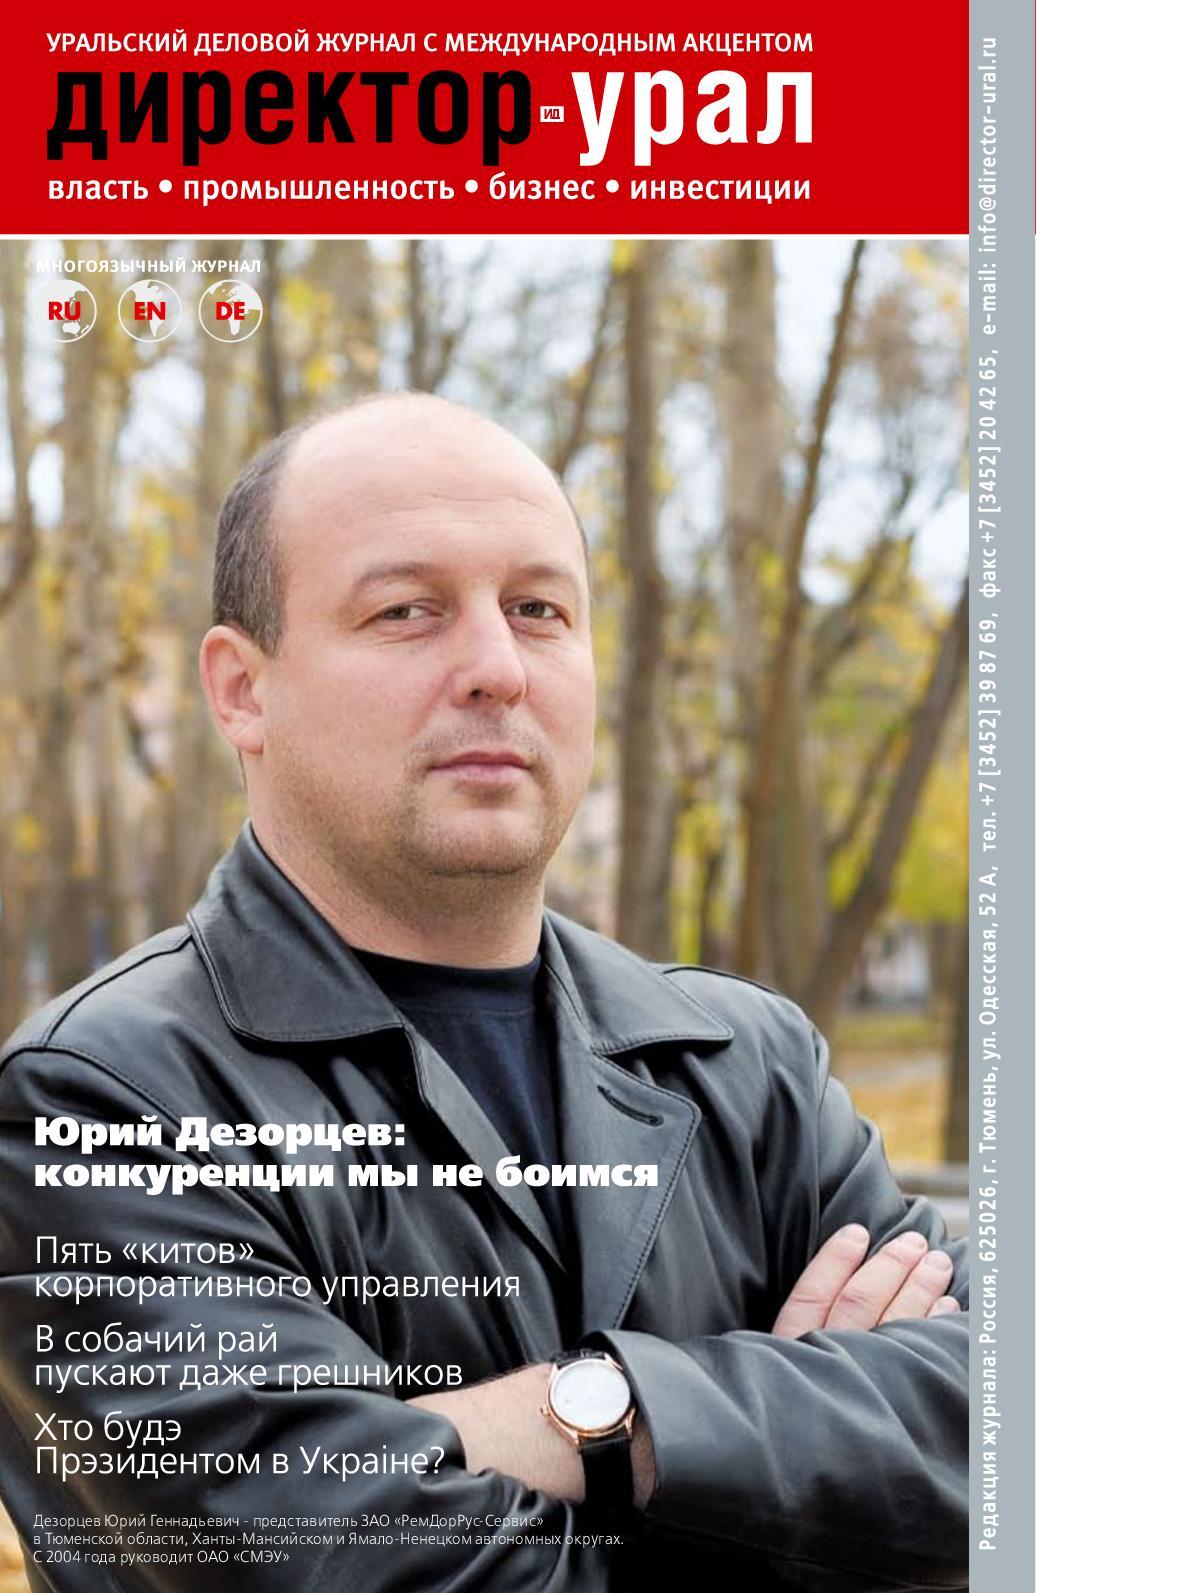 Calaméo - Директор-Урал №4 360034a3abd